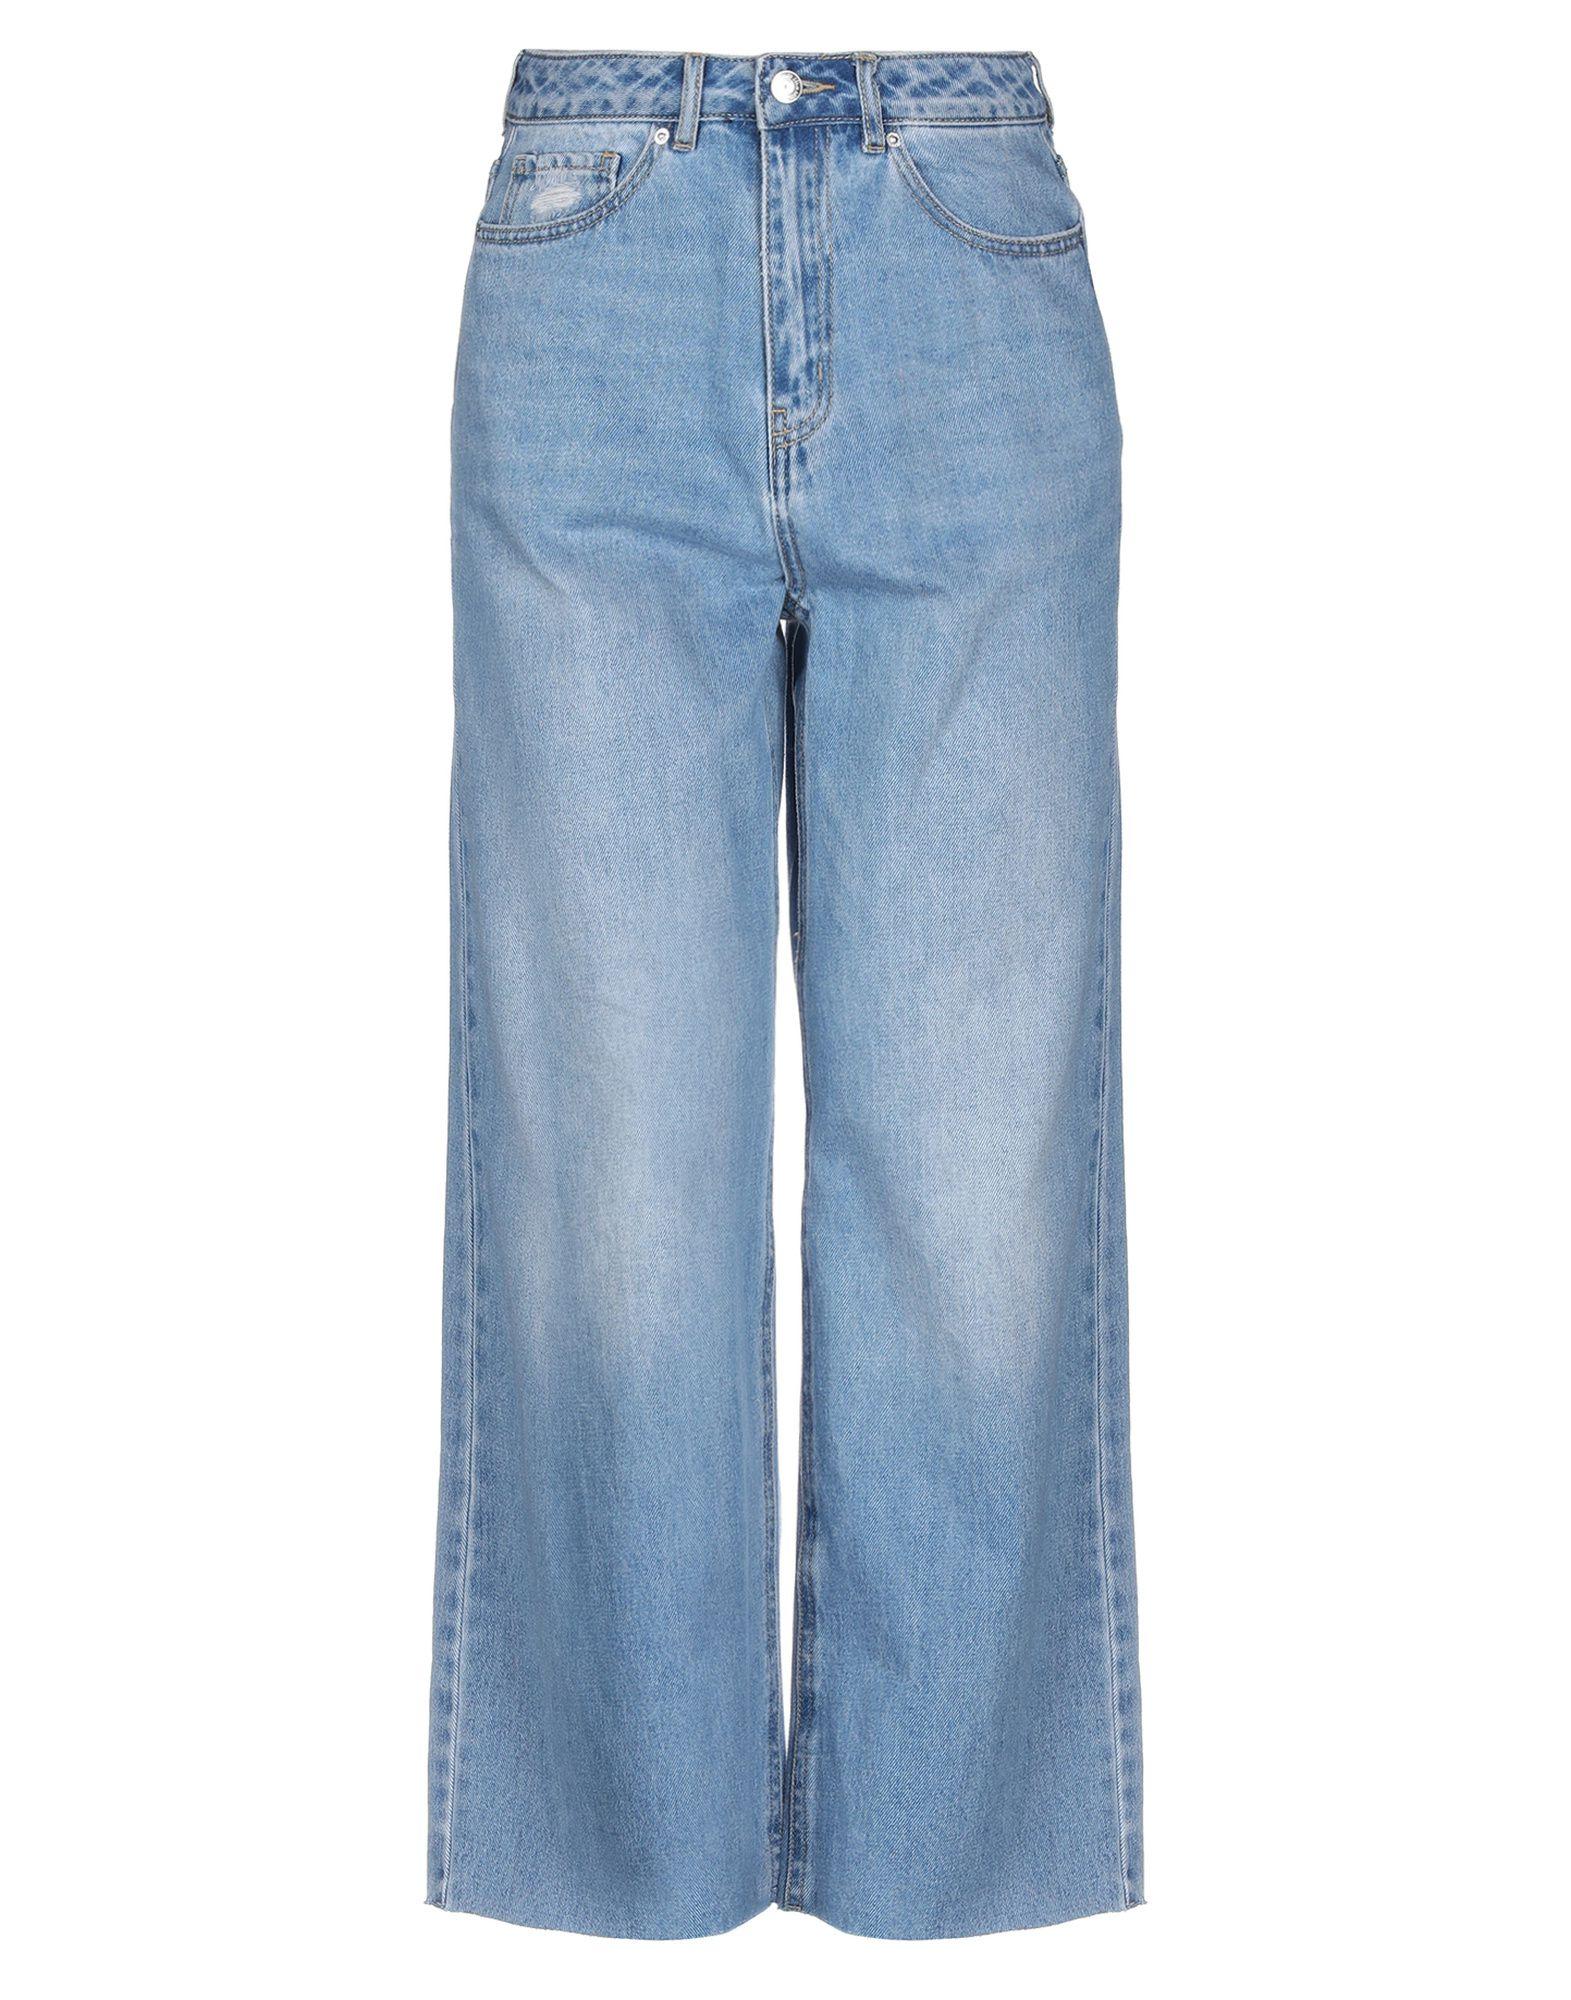 Vero Moda  Denim pants